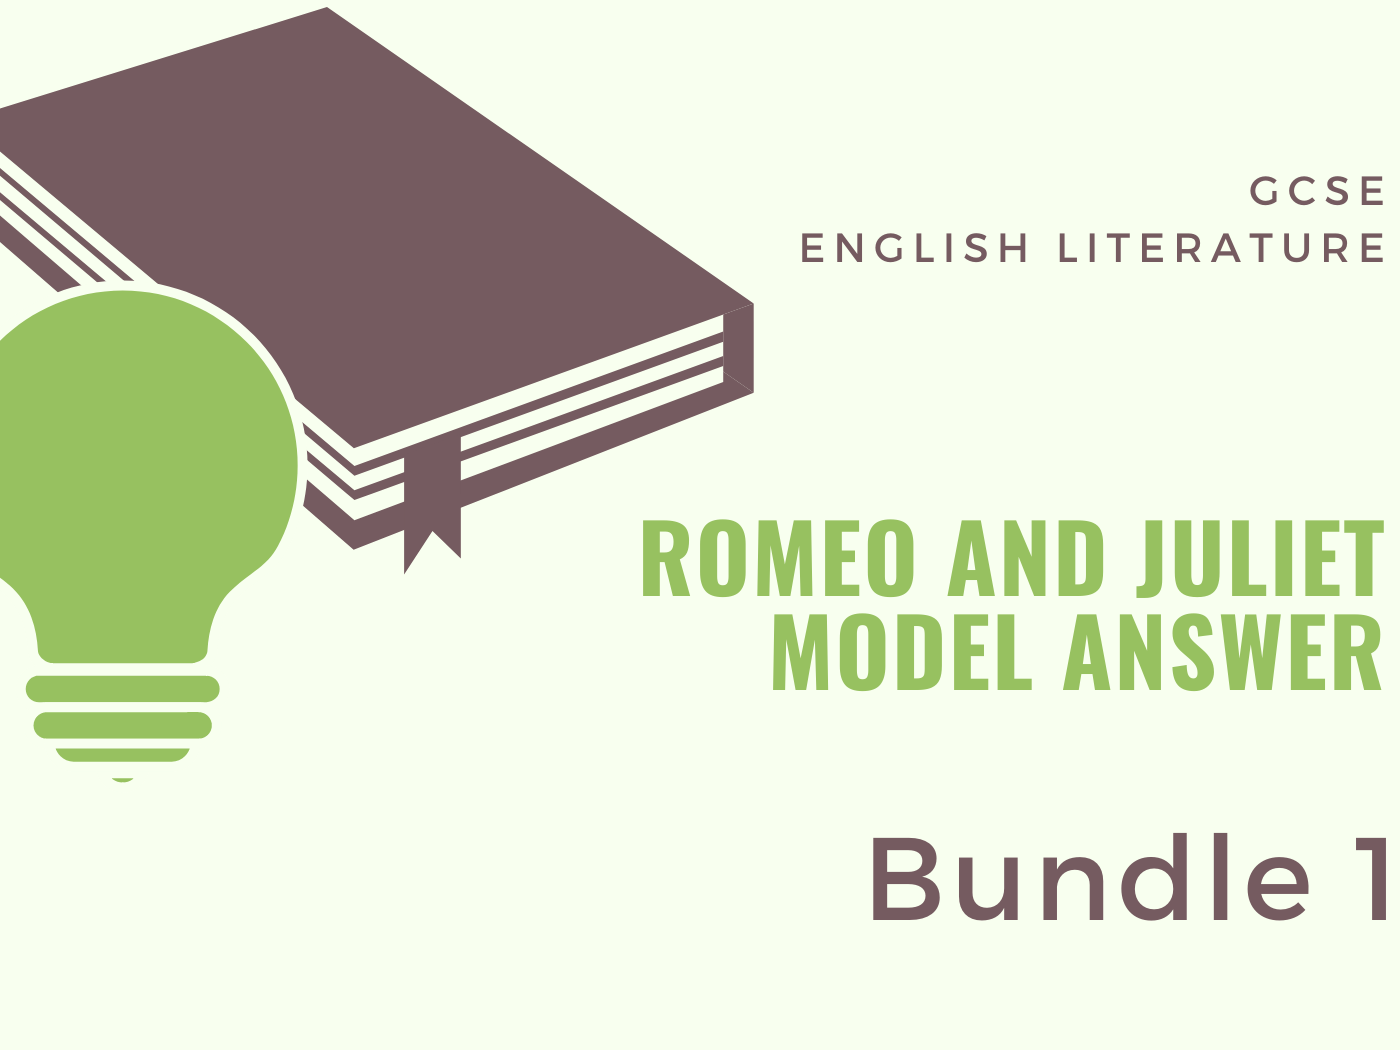 Romeo and Juliet: Model Answers - Bundle 1